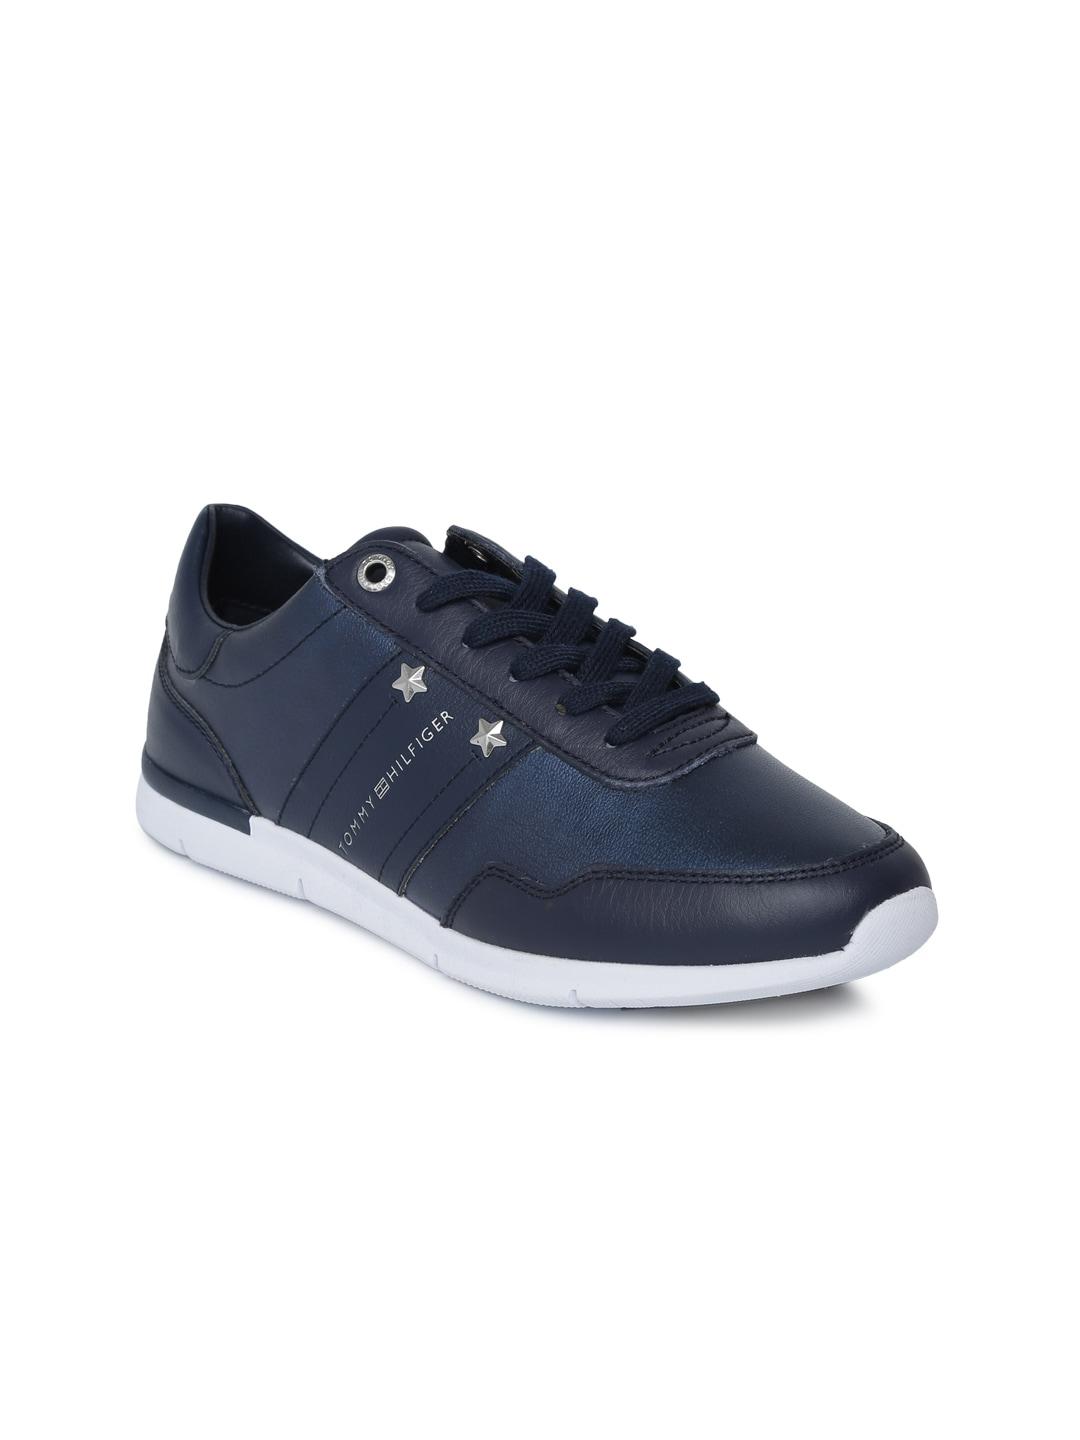 8d7eec3eb4c Tommy Hilfiger Shoes - Buy Tommy Hilfiger Shoes Online - Myntra